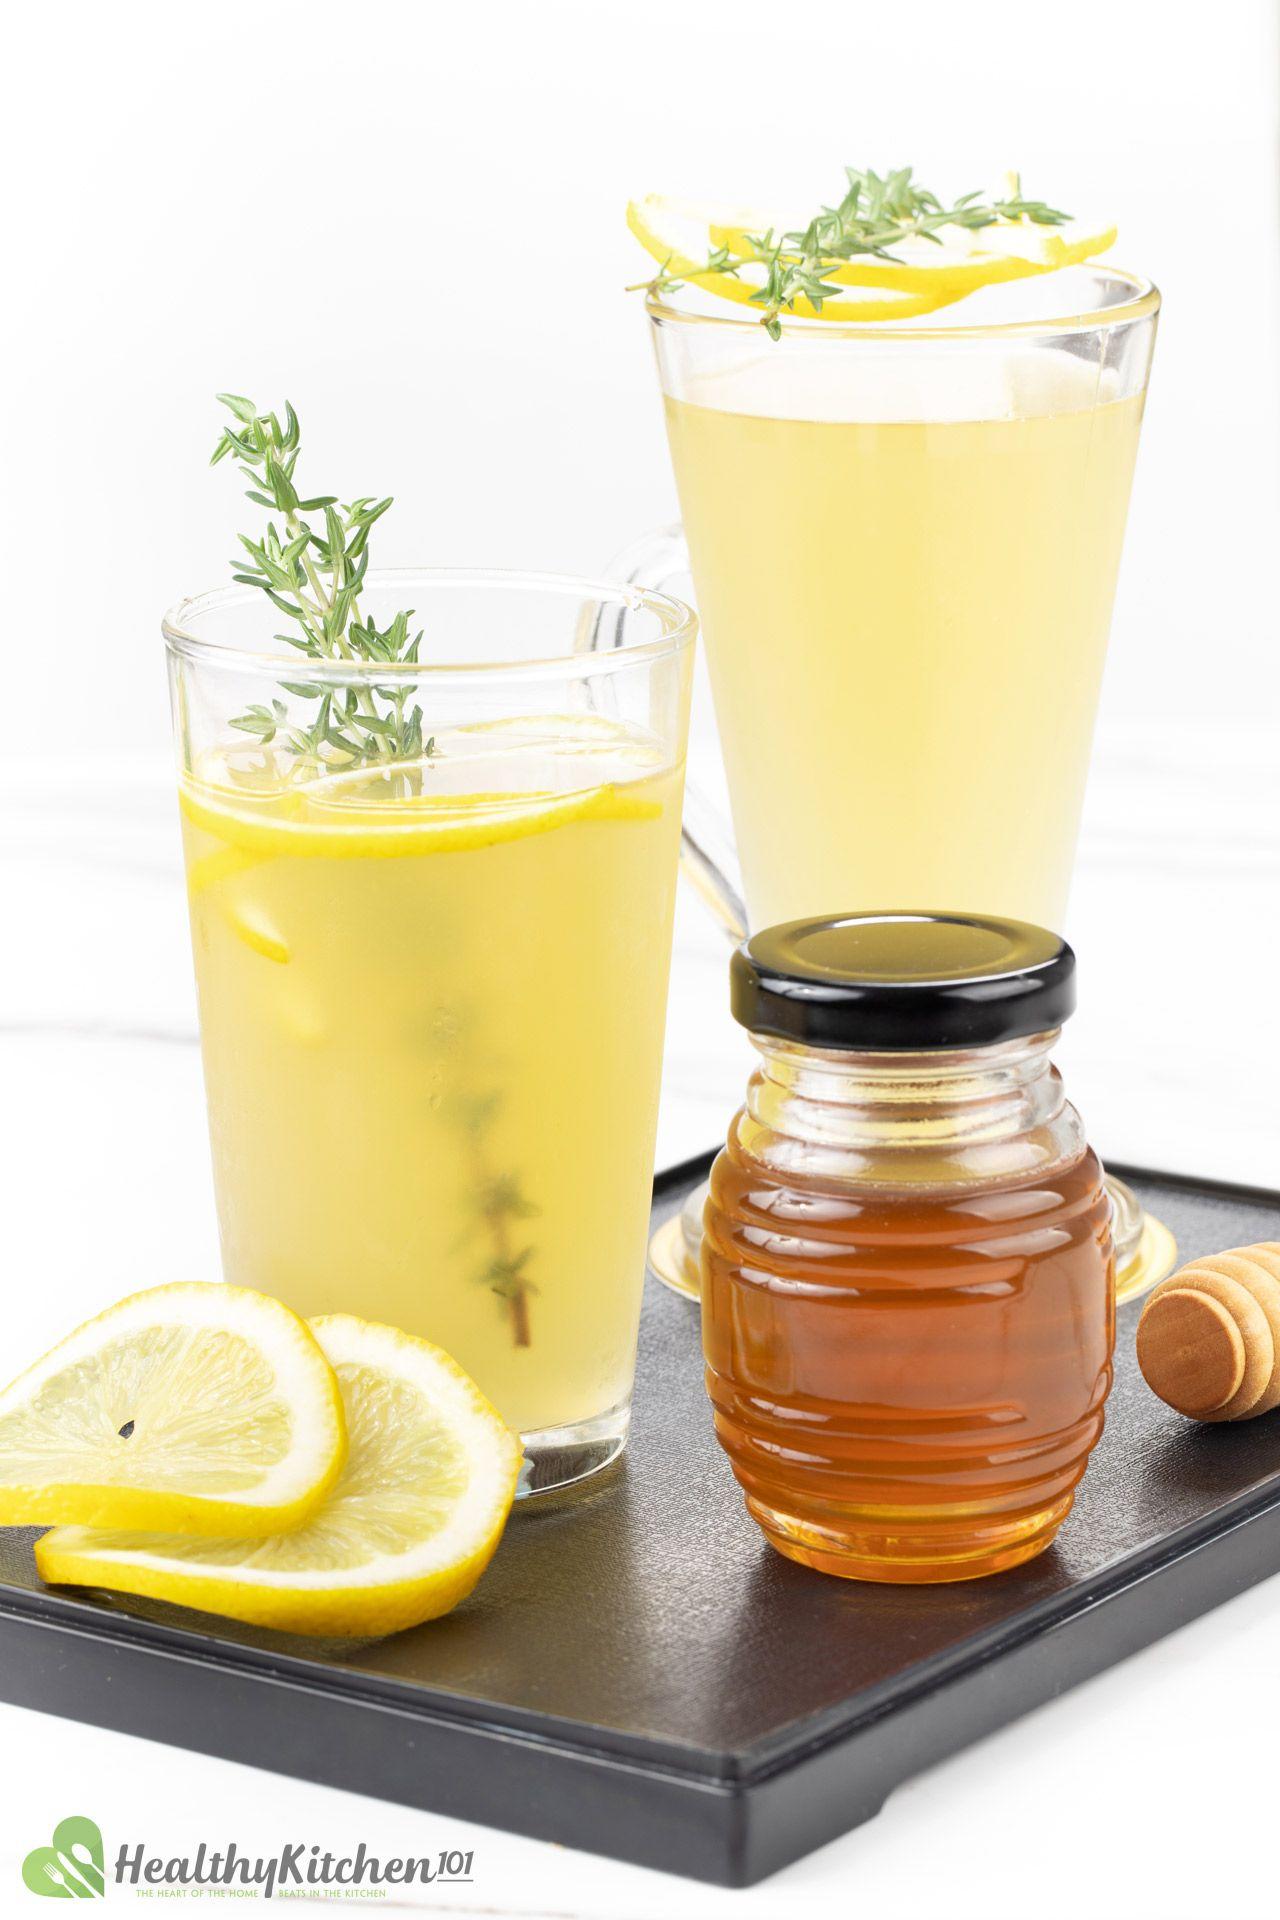 Is Honey and Lemon Juice healthy